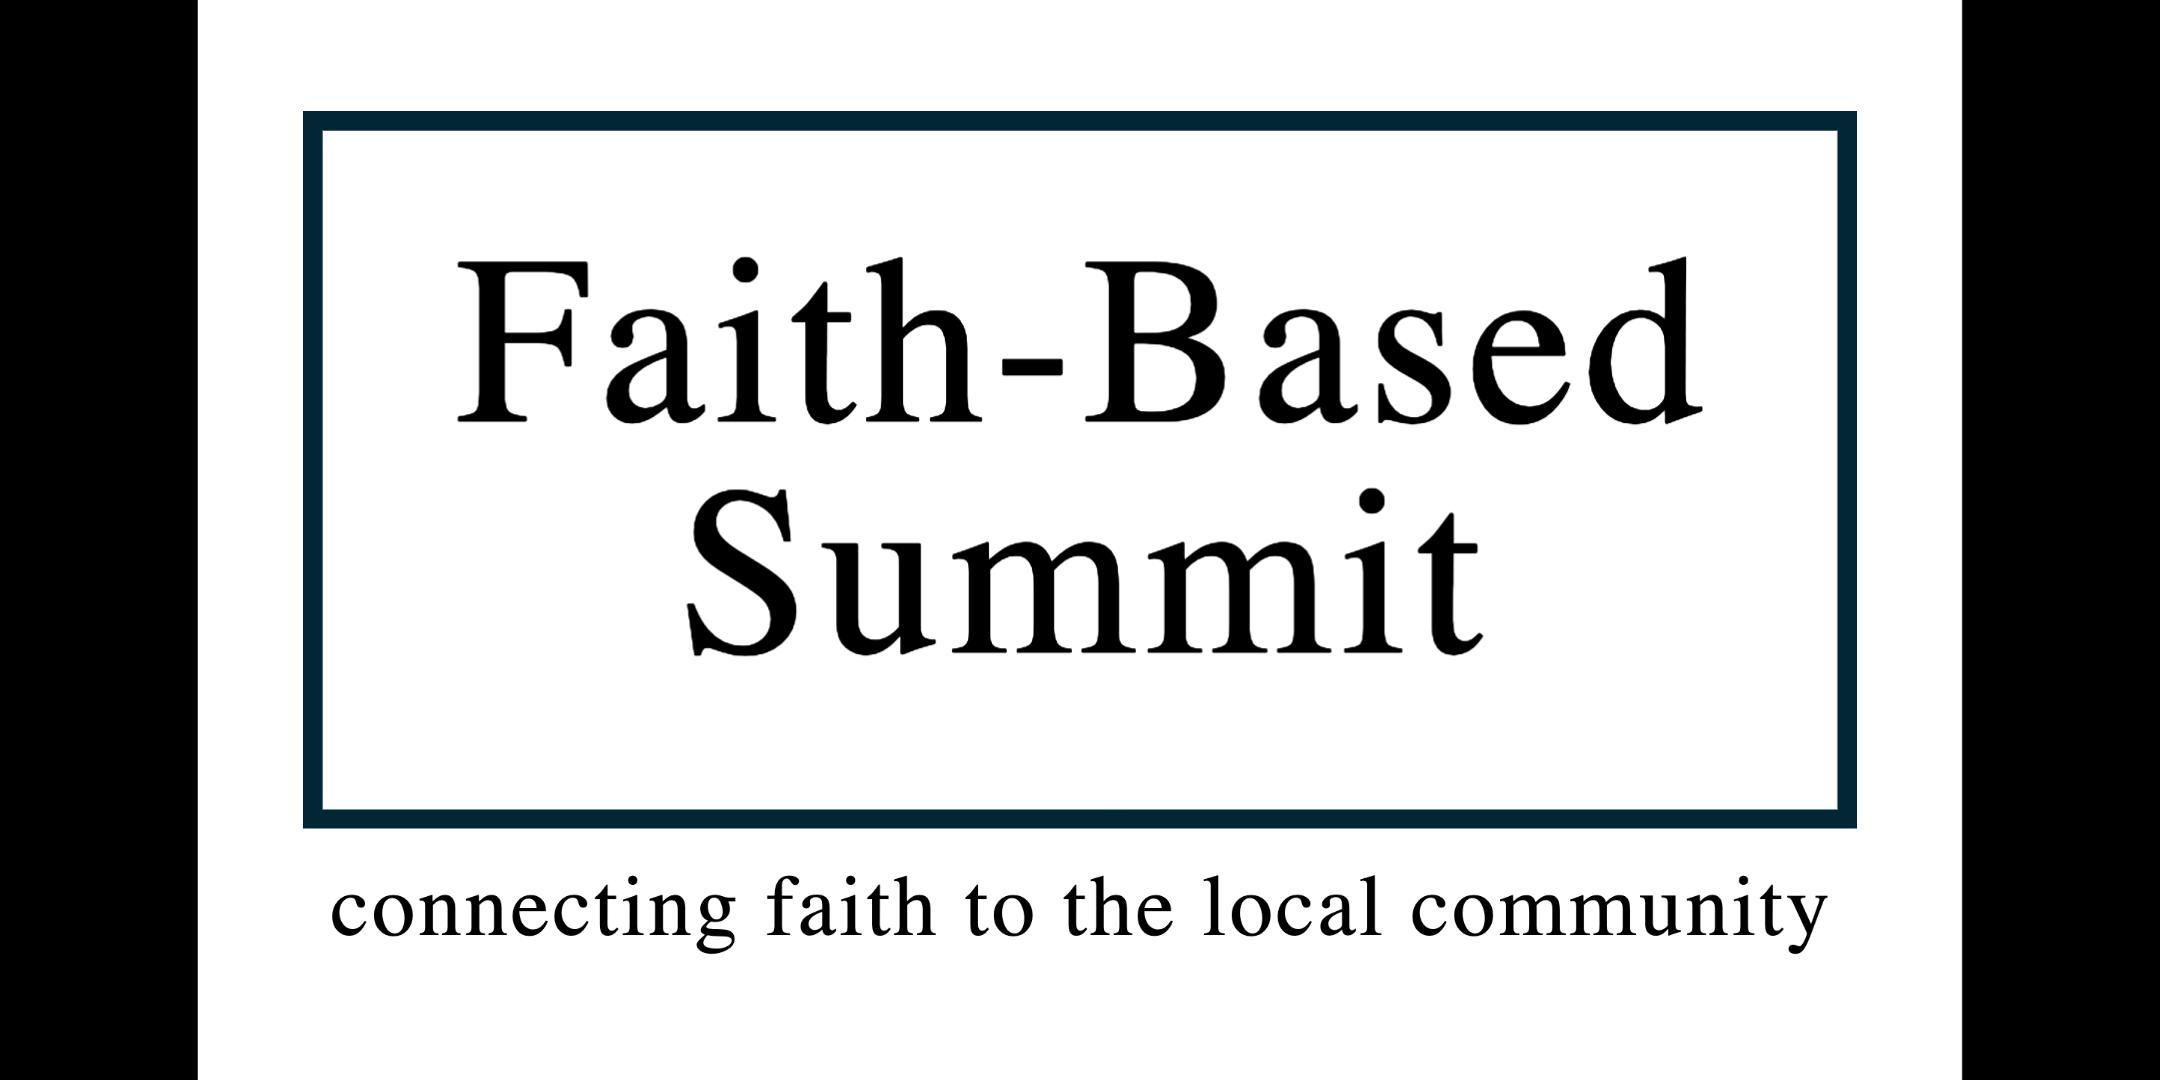 Faith-Based Summit